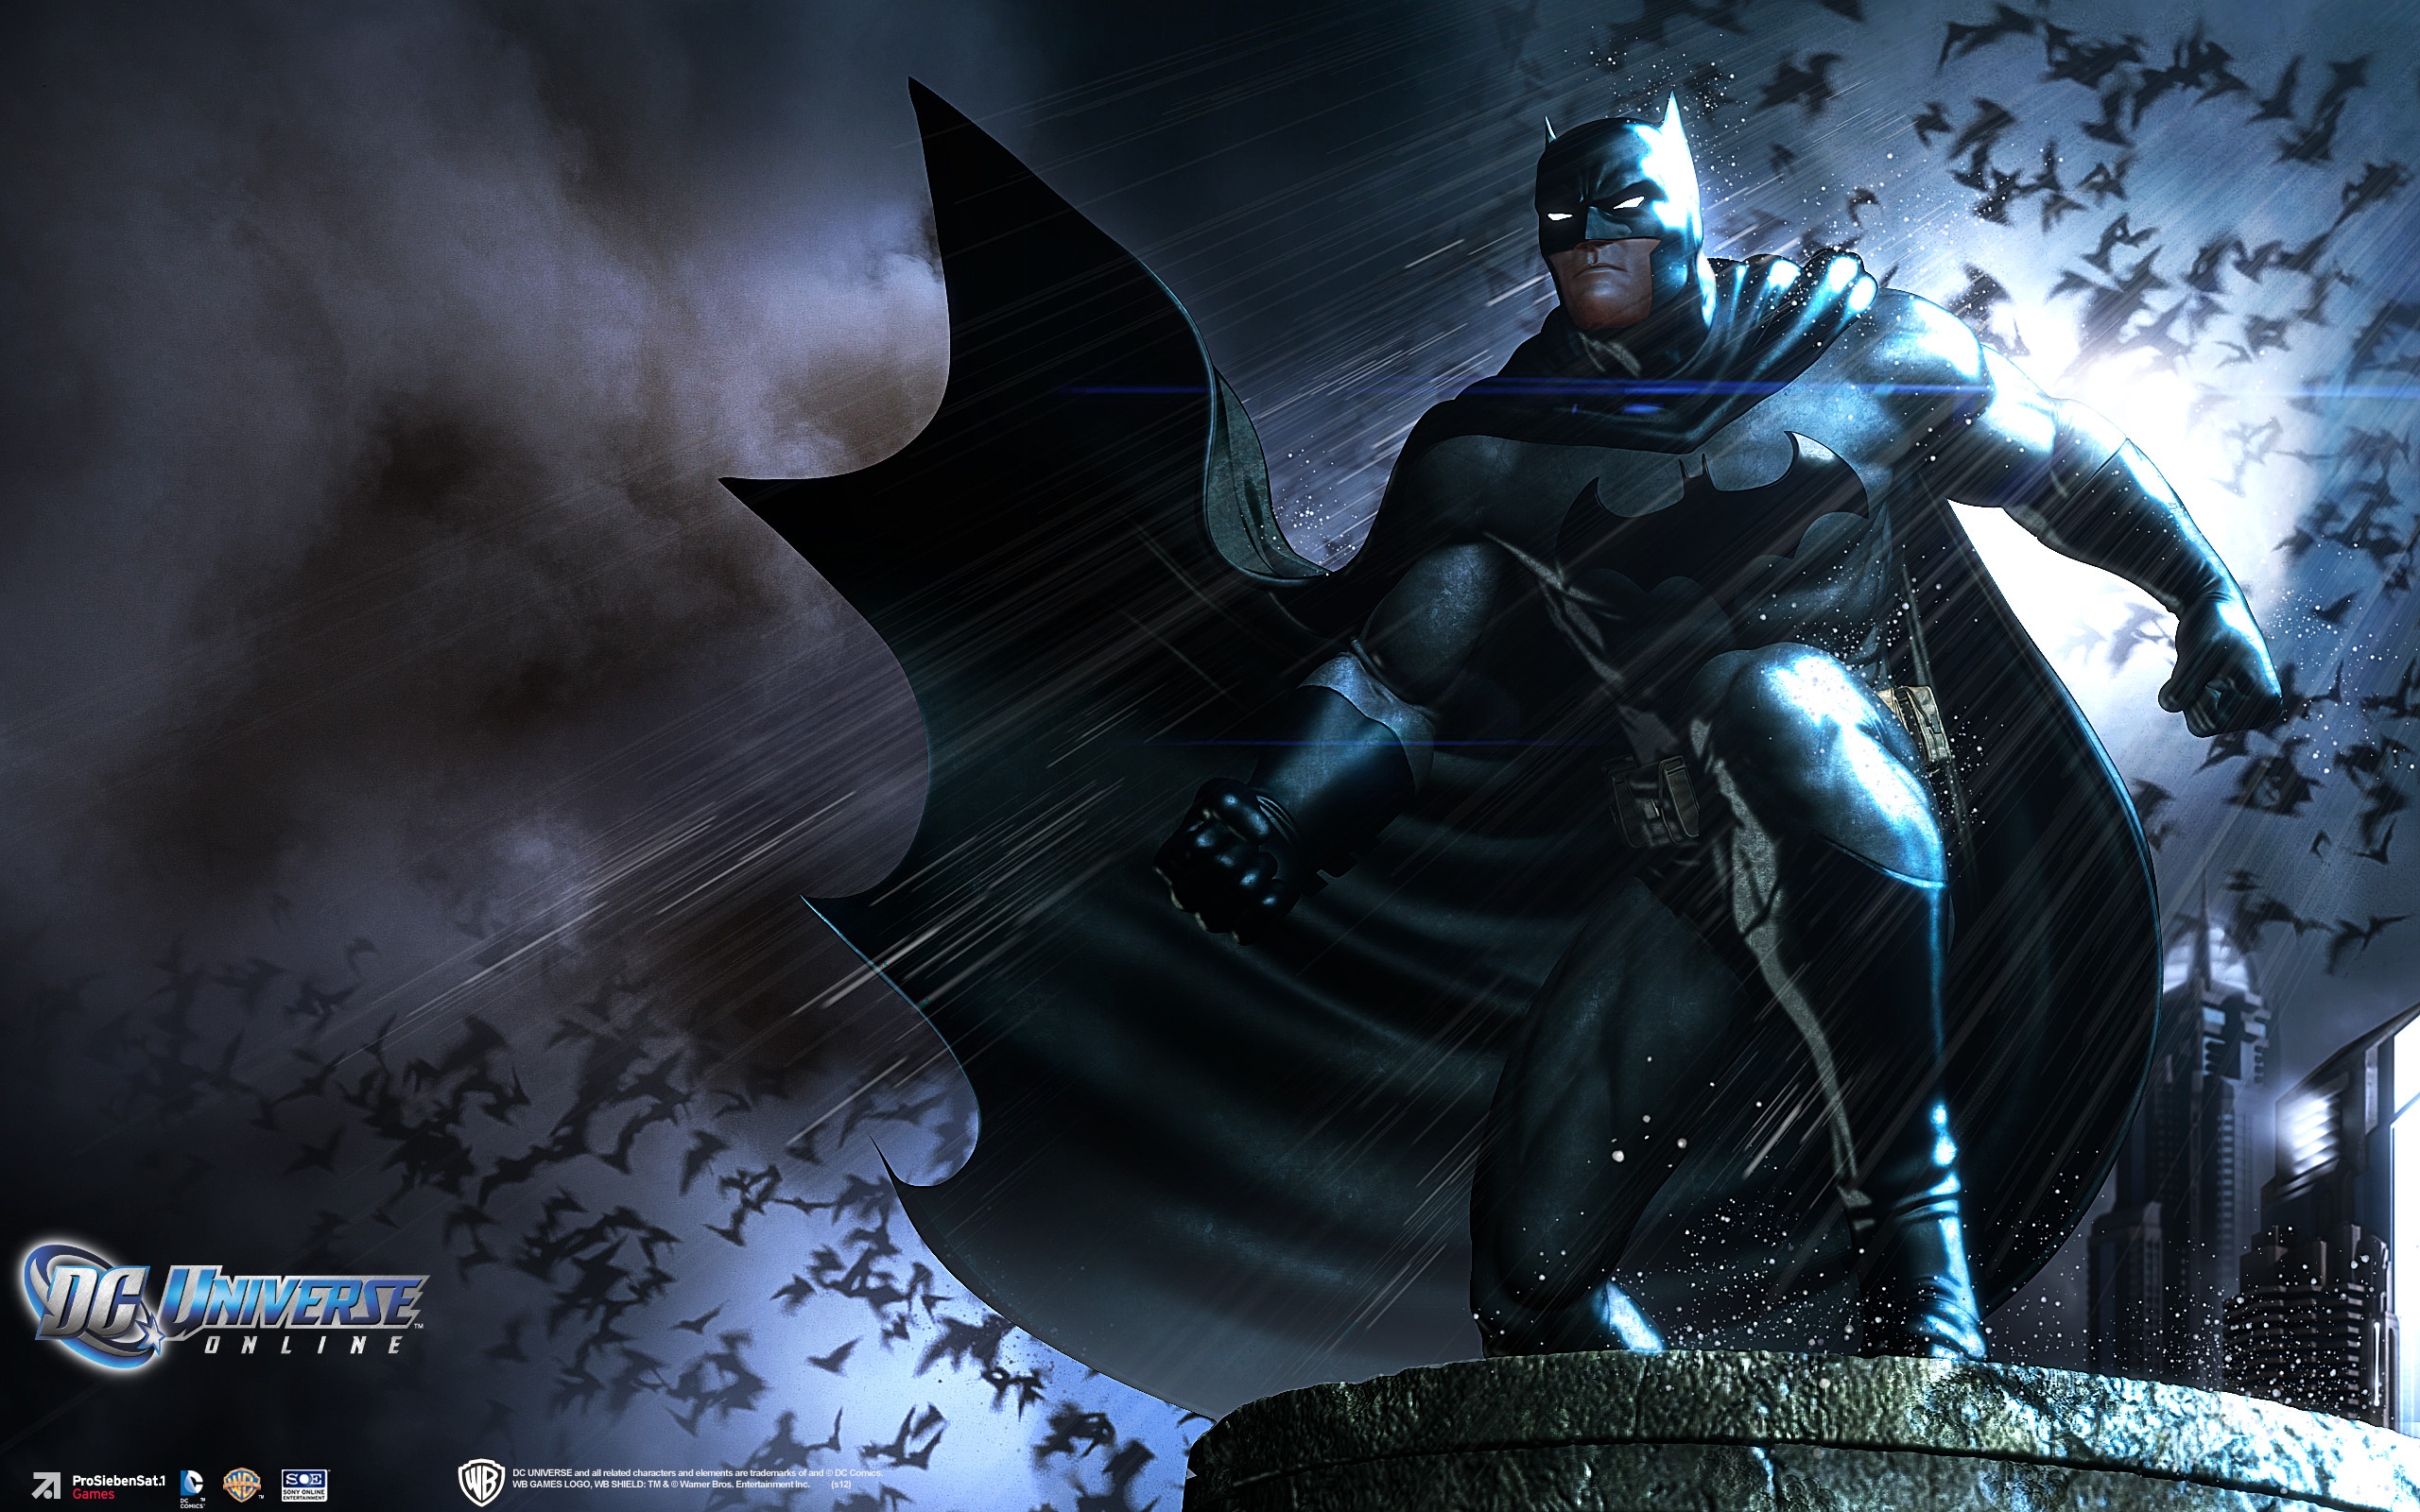 DC UNIVERSE ONLINE d-c superhero comics batman d wallpaper background